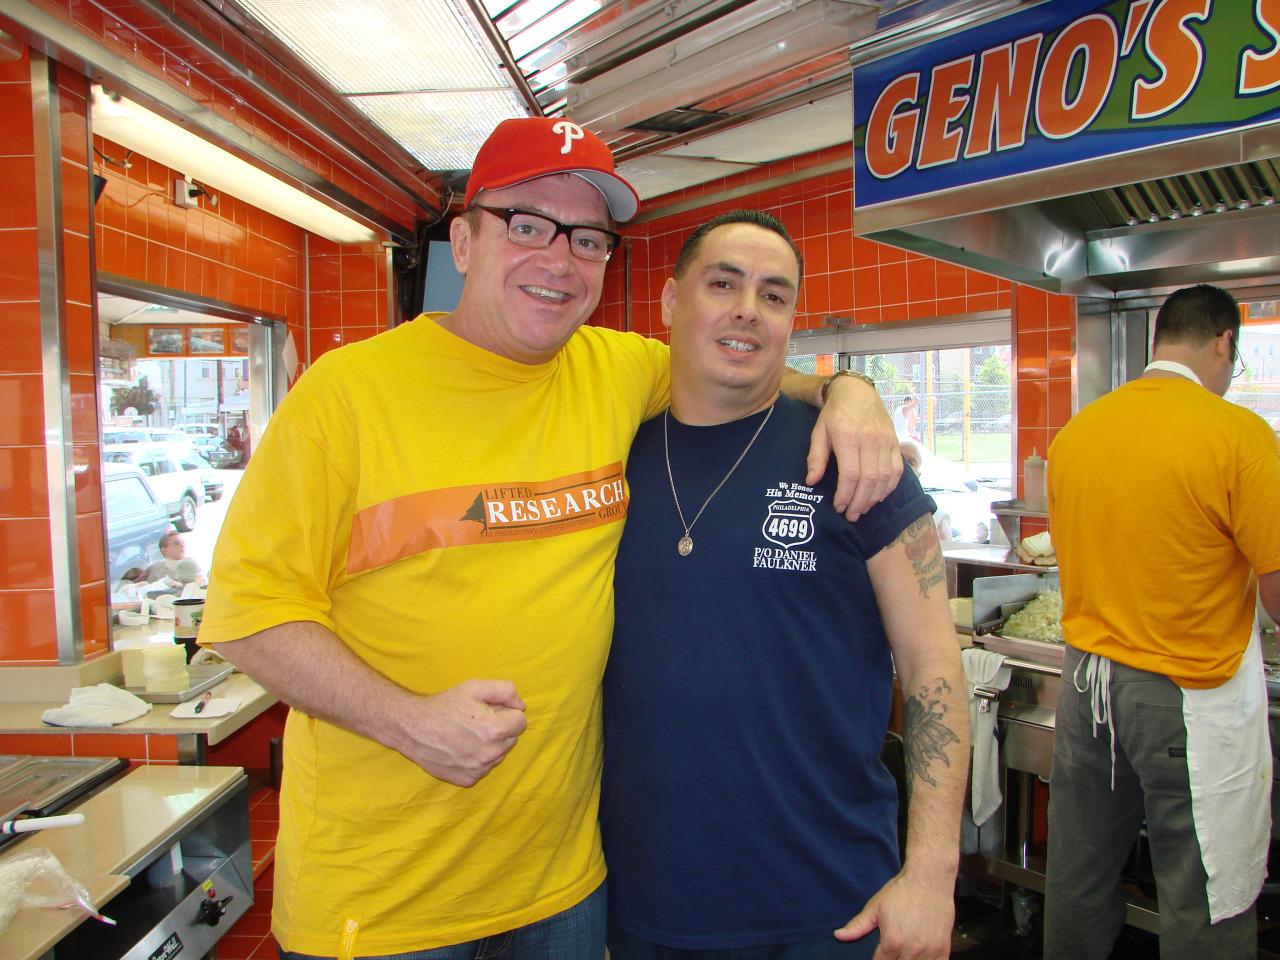 Tom Arnold at Geno's Steaks